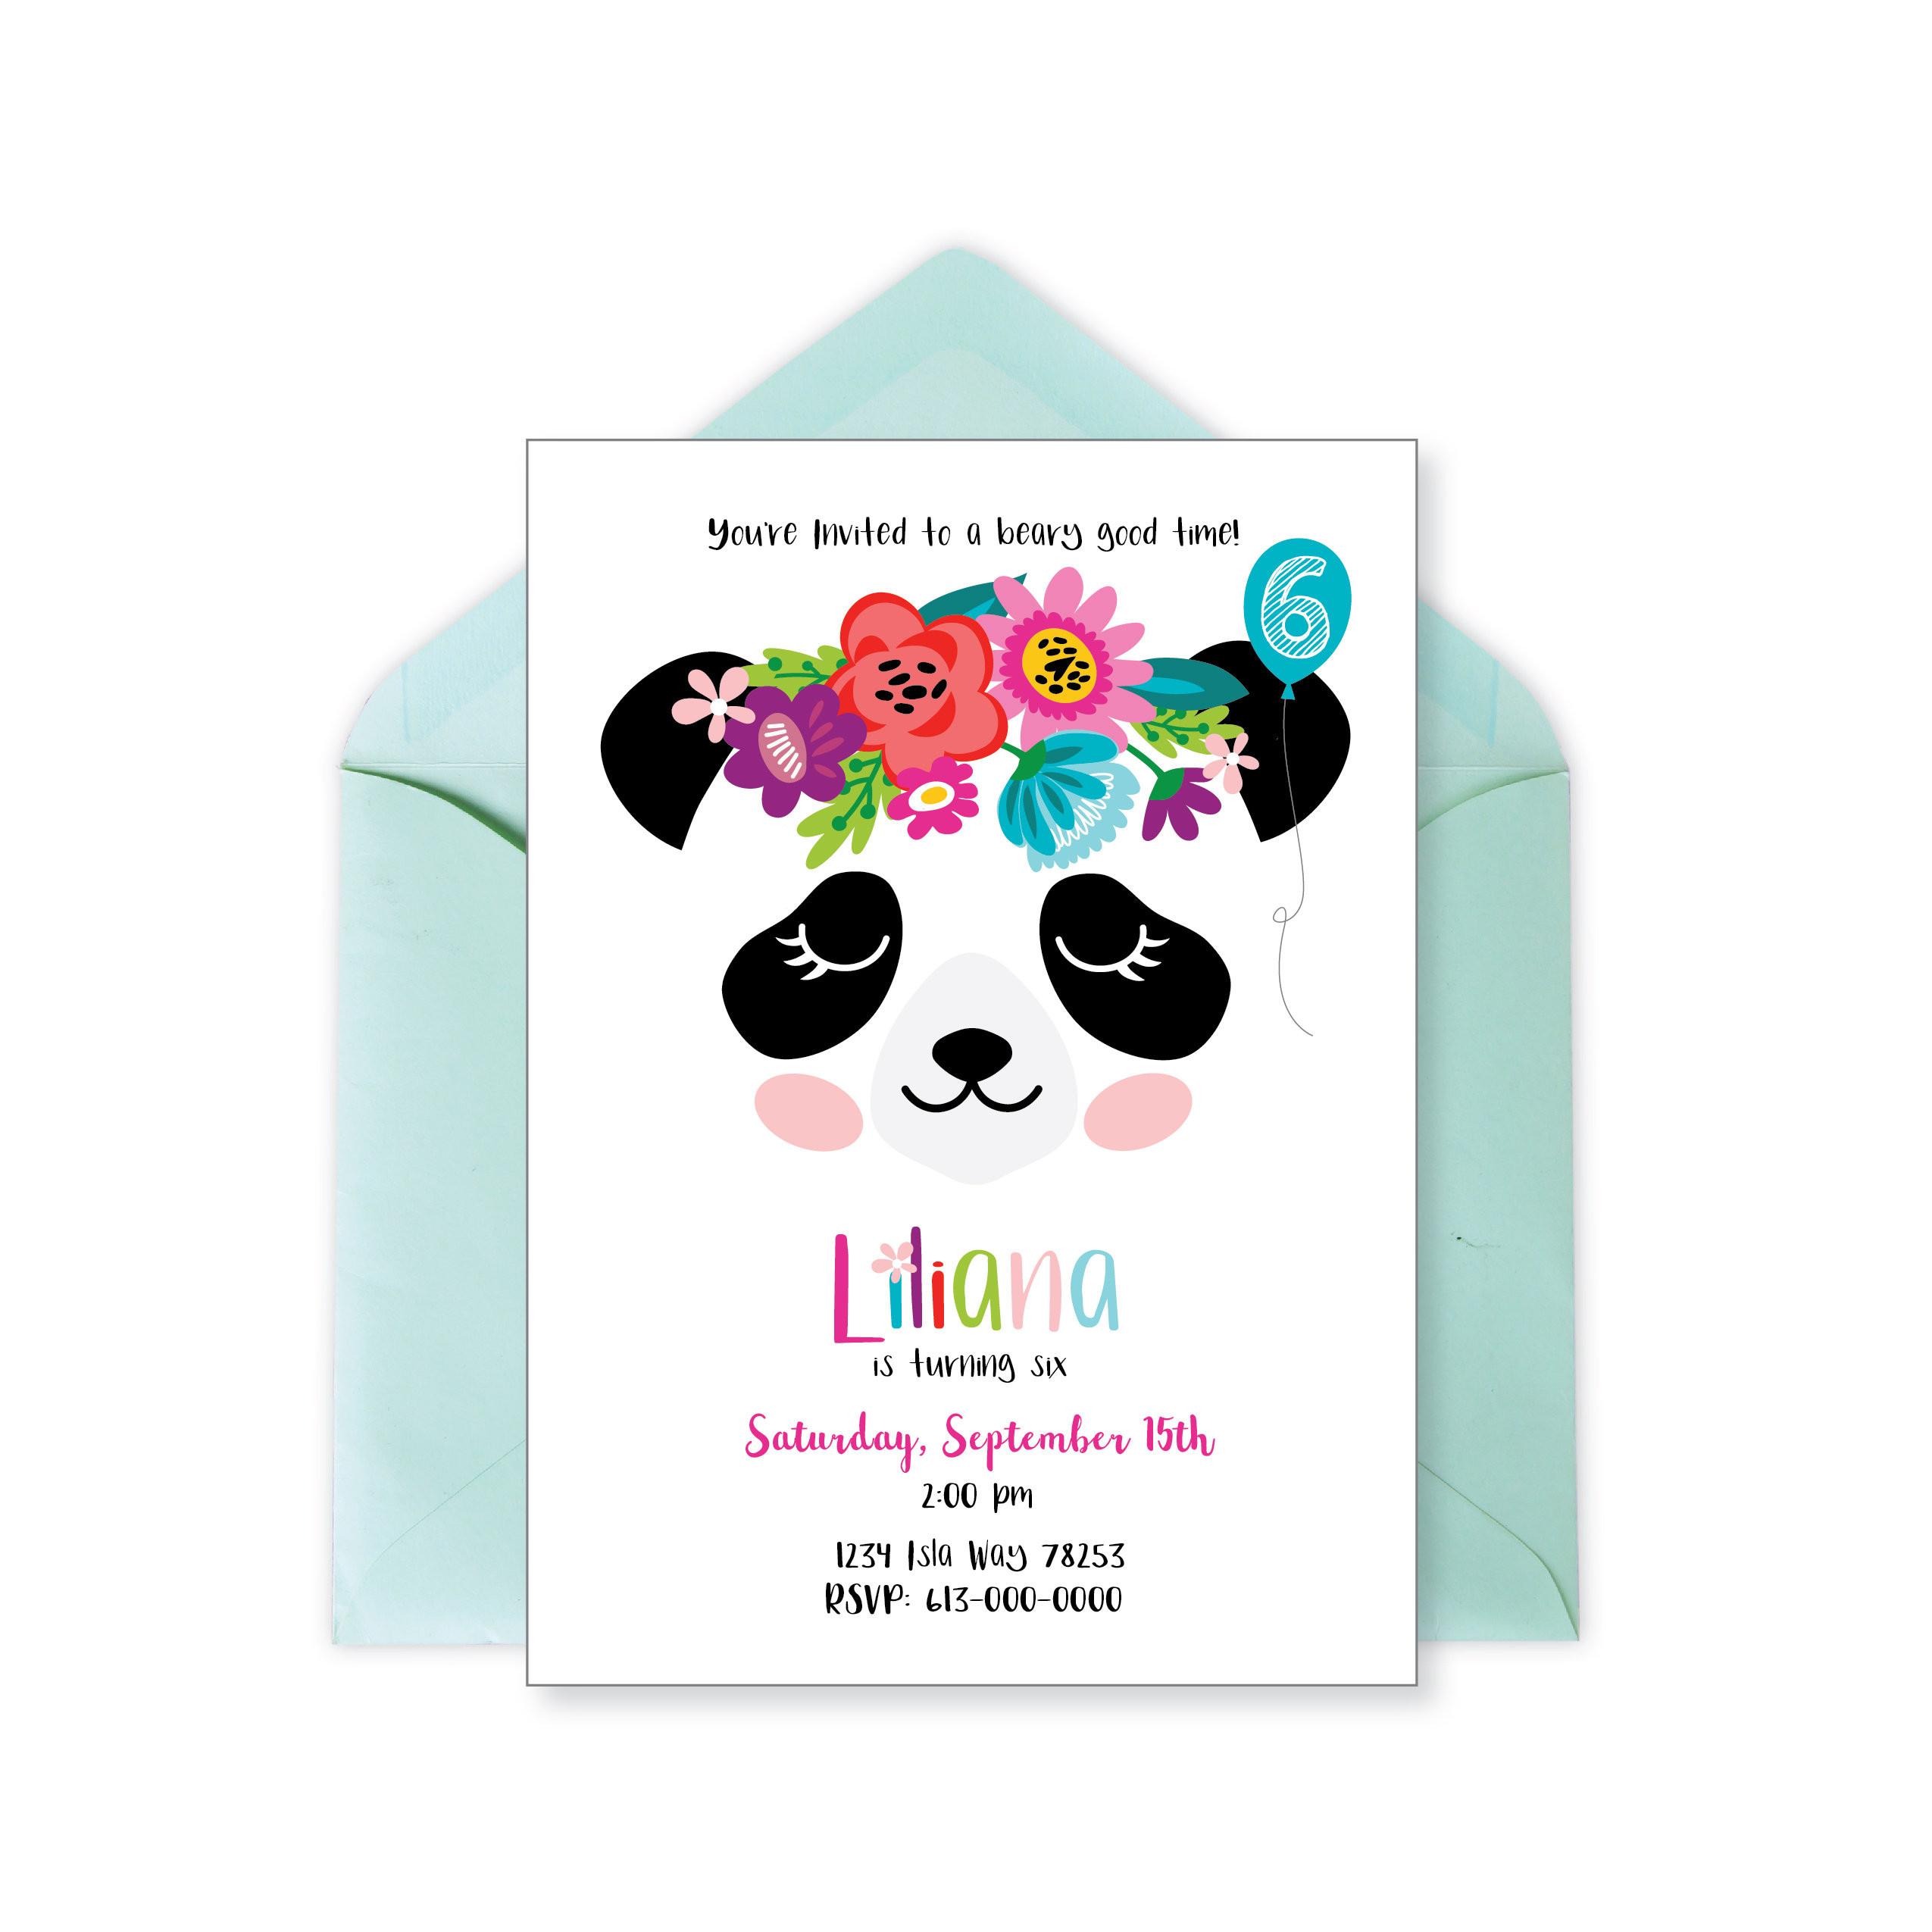 Panda Birthday Invitations  Panda Invitation Panda Birthday Party Panda Face